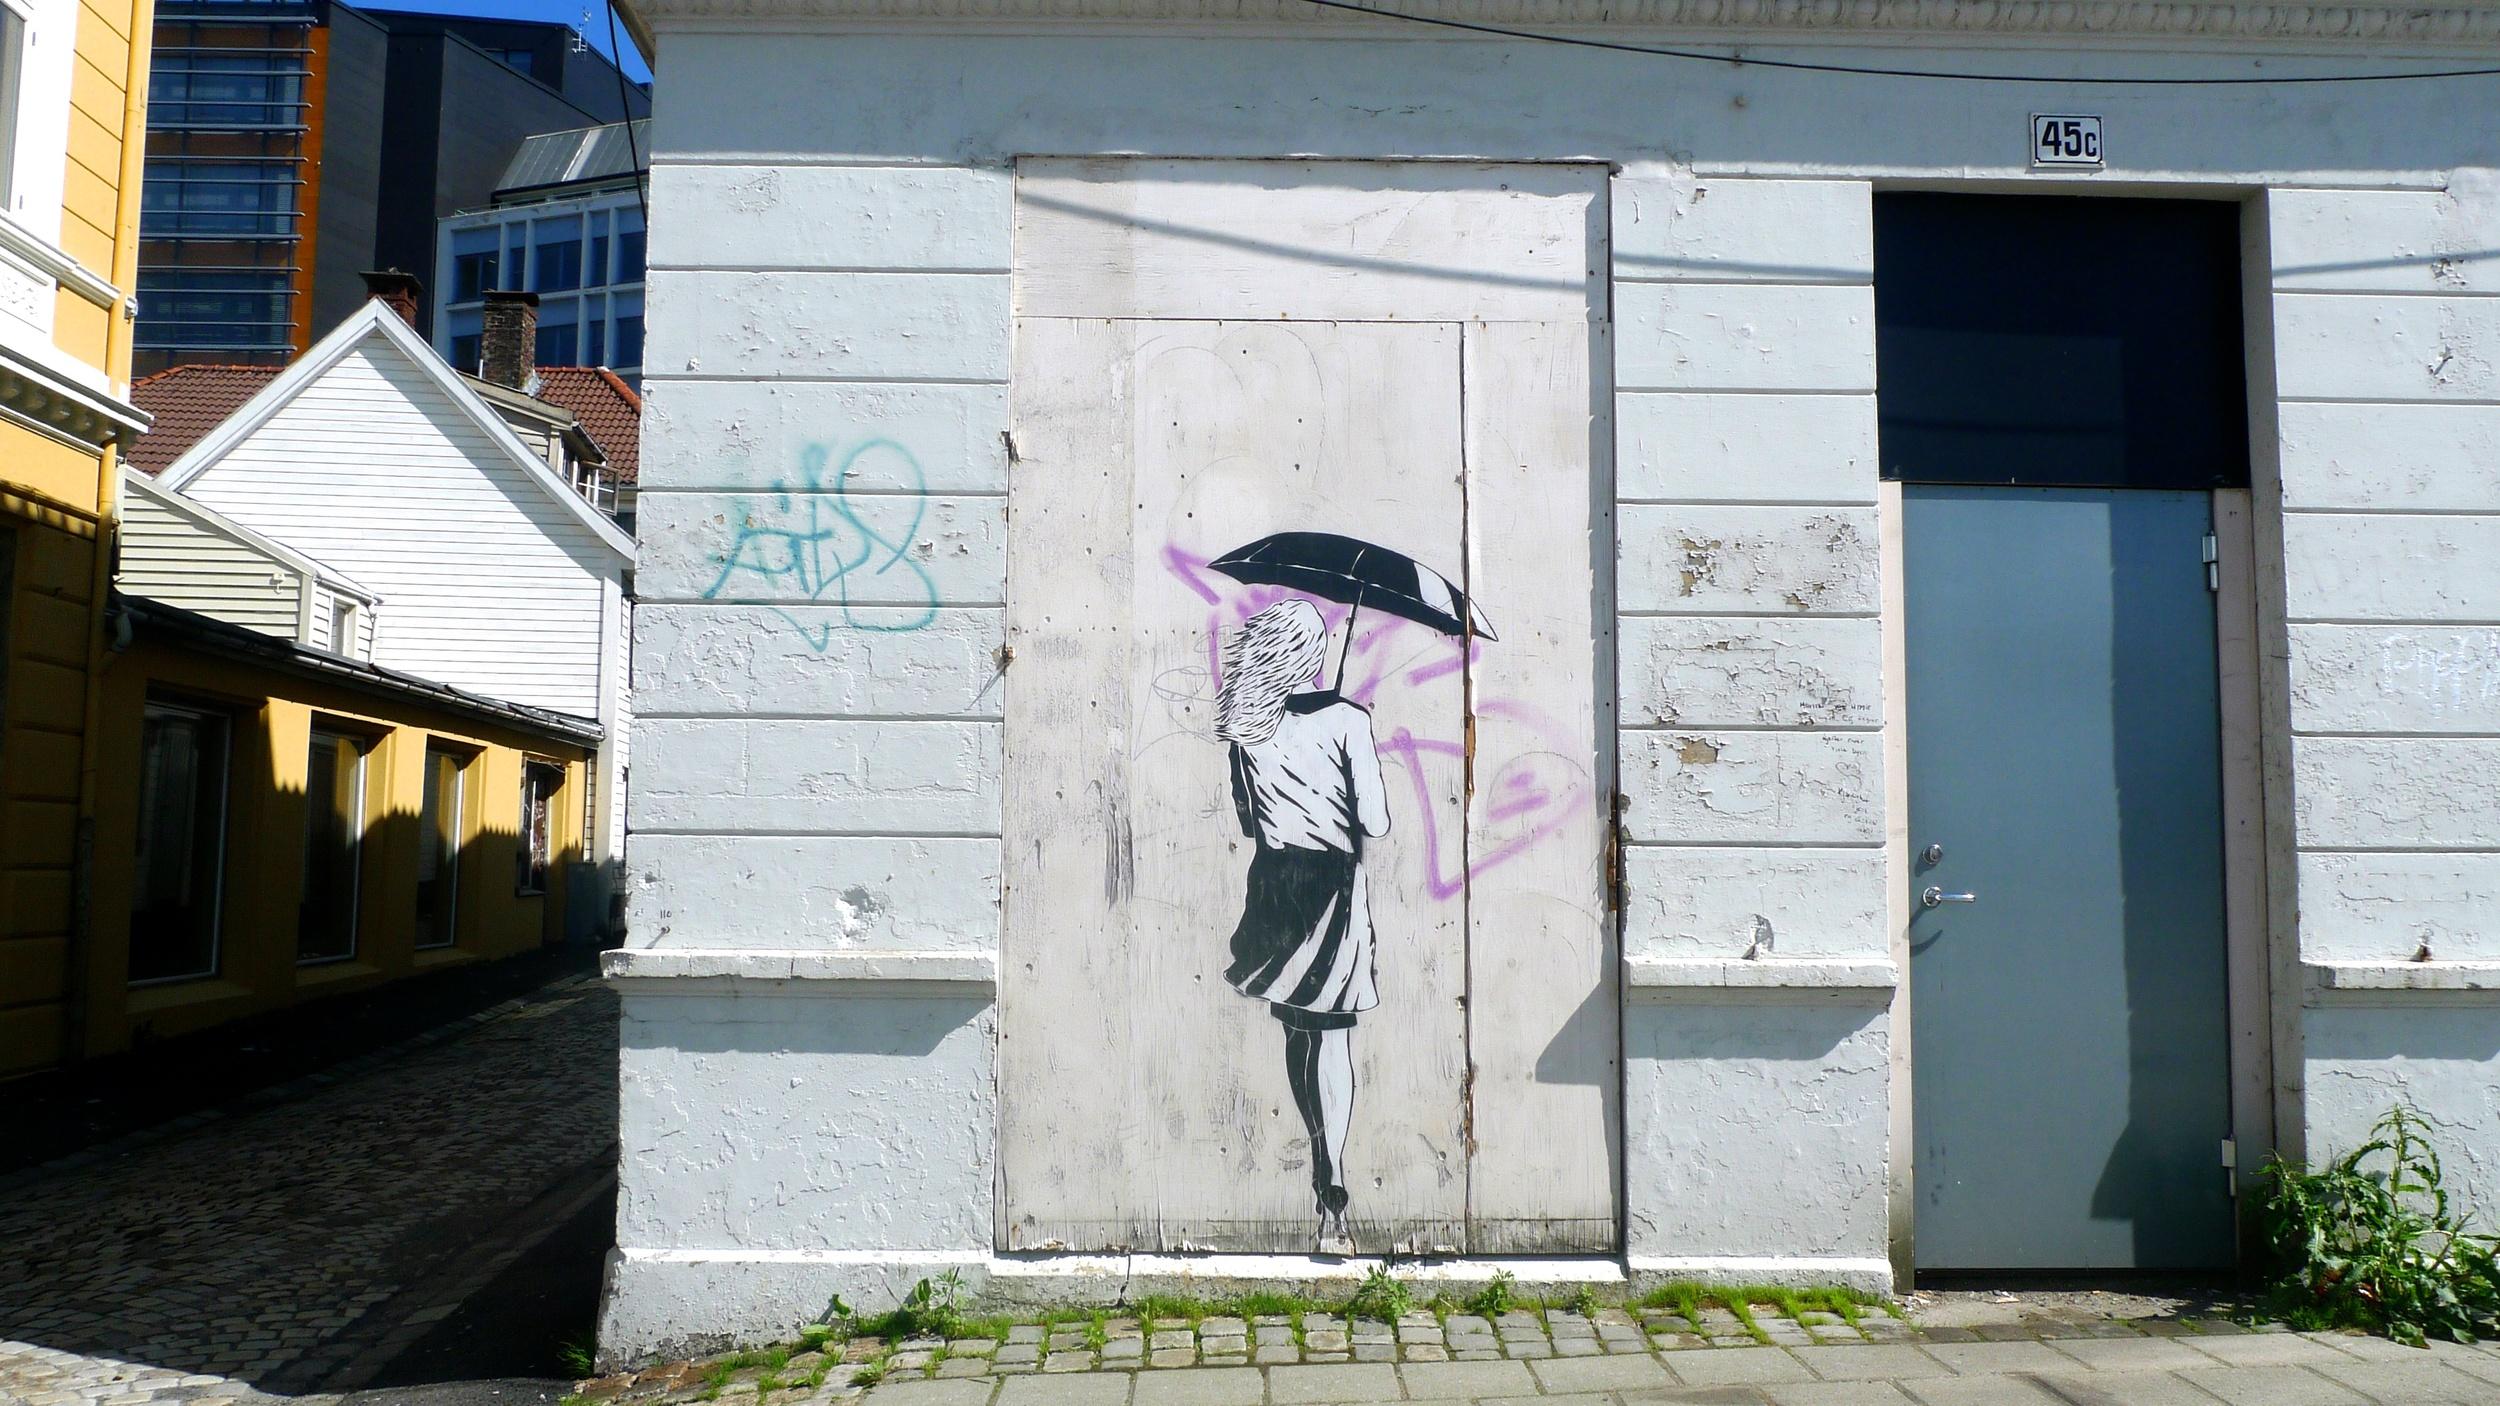 vest_nostet_jente_paraply